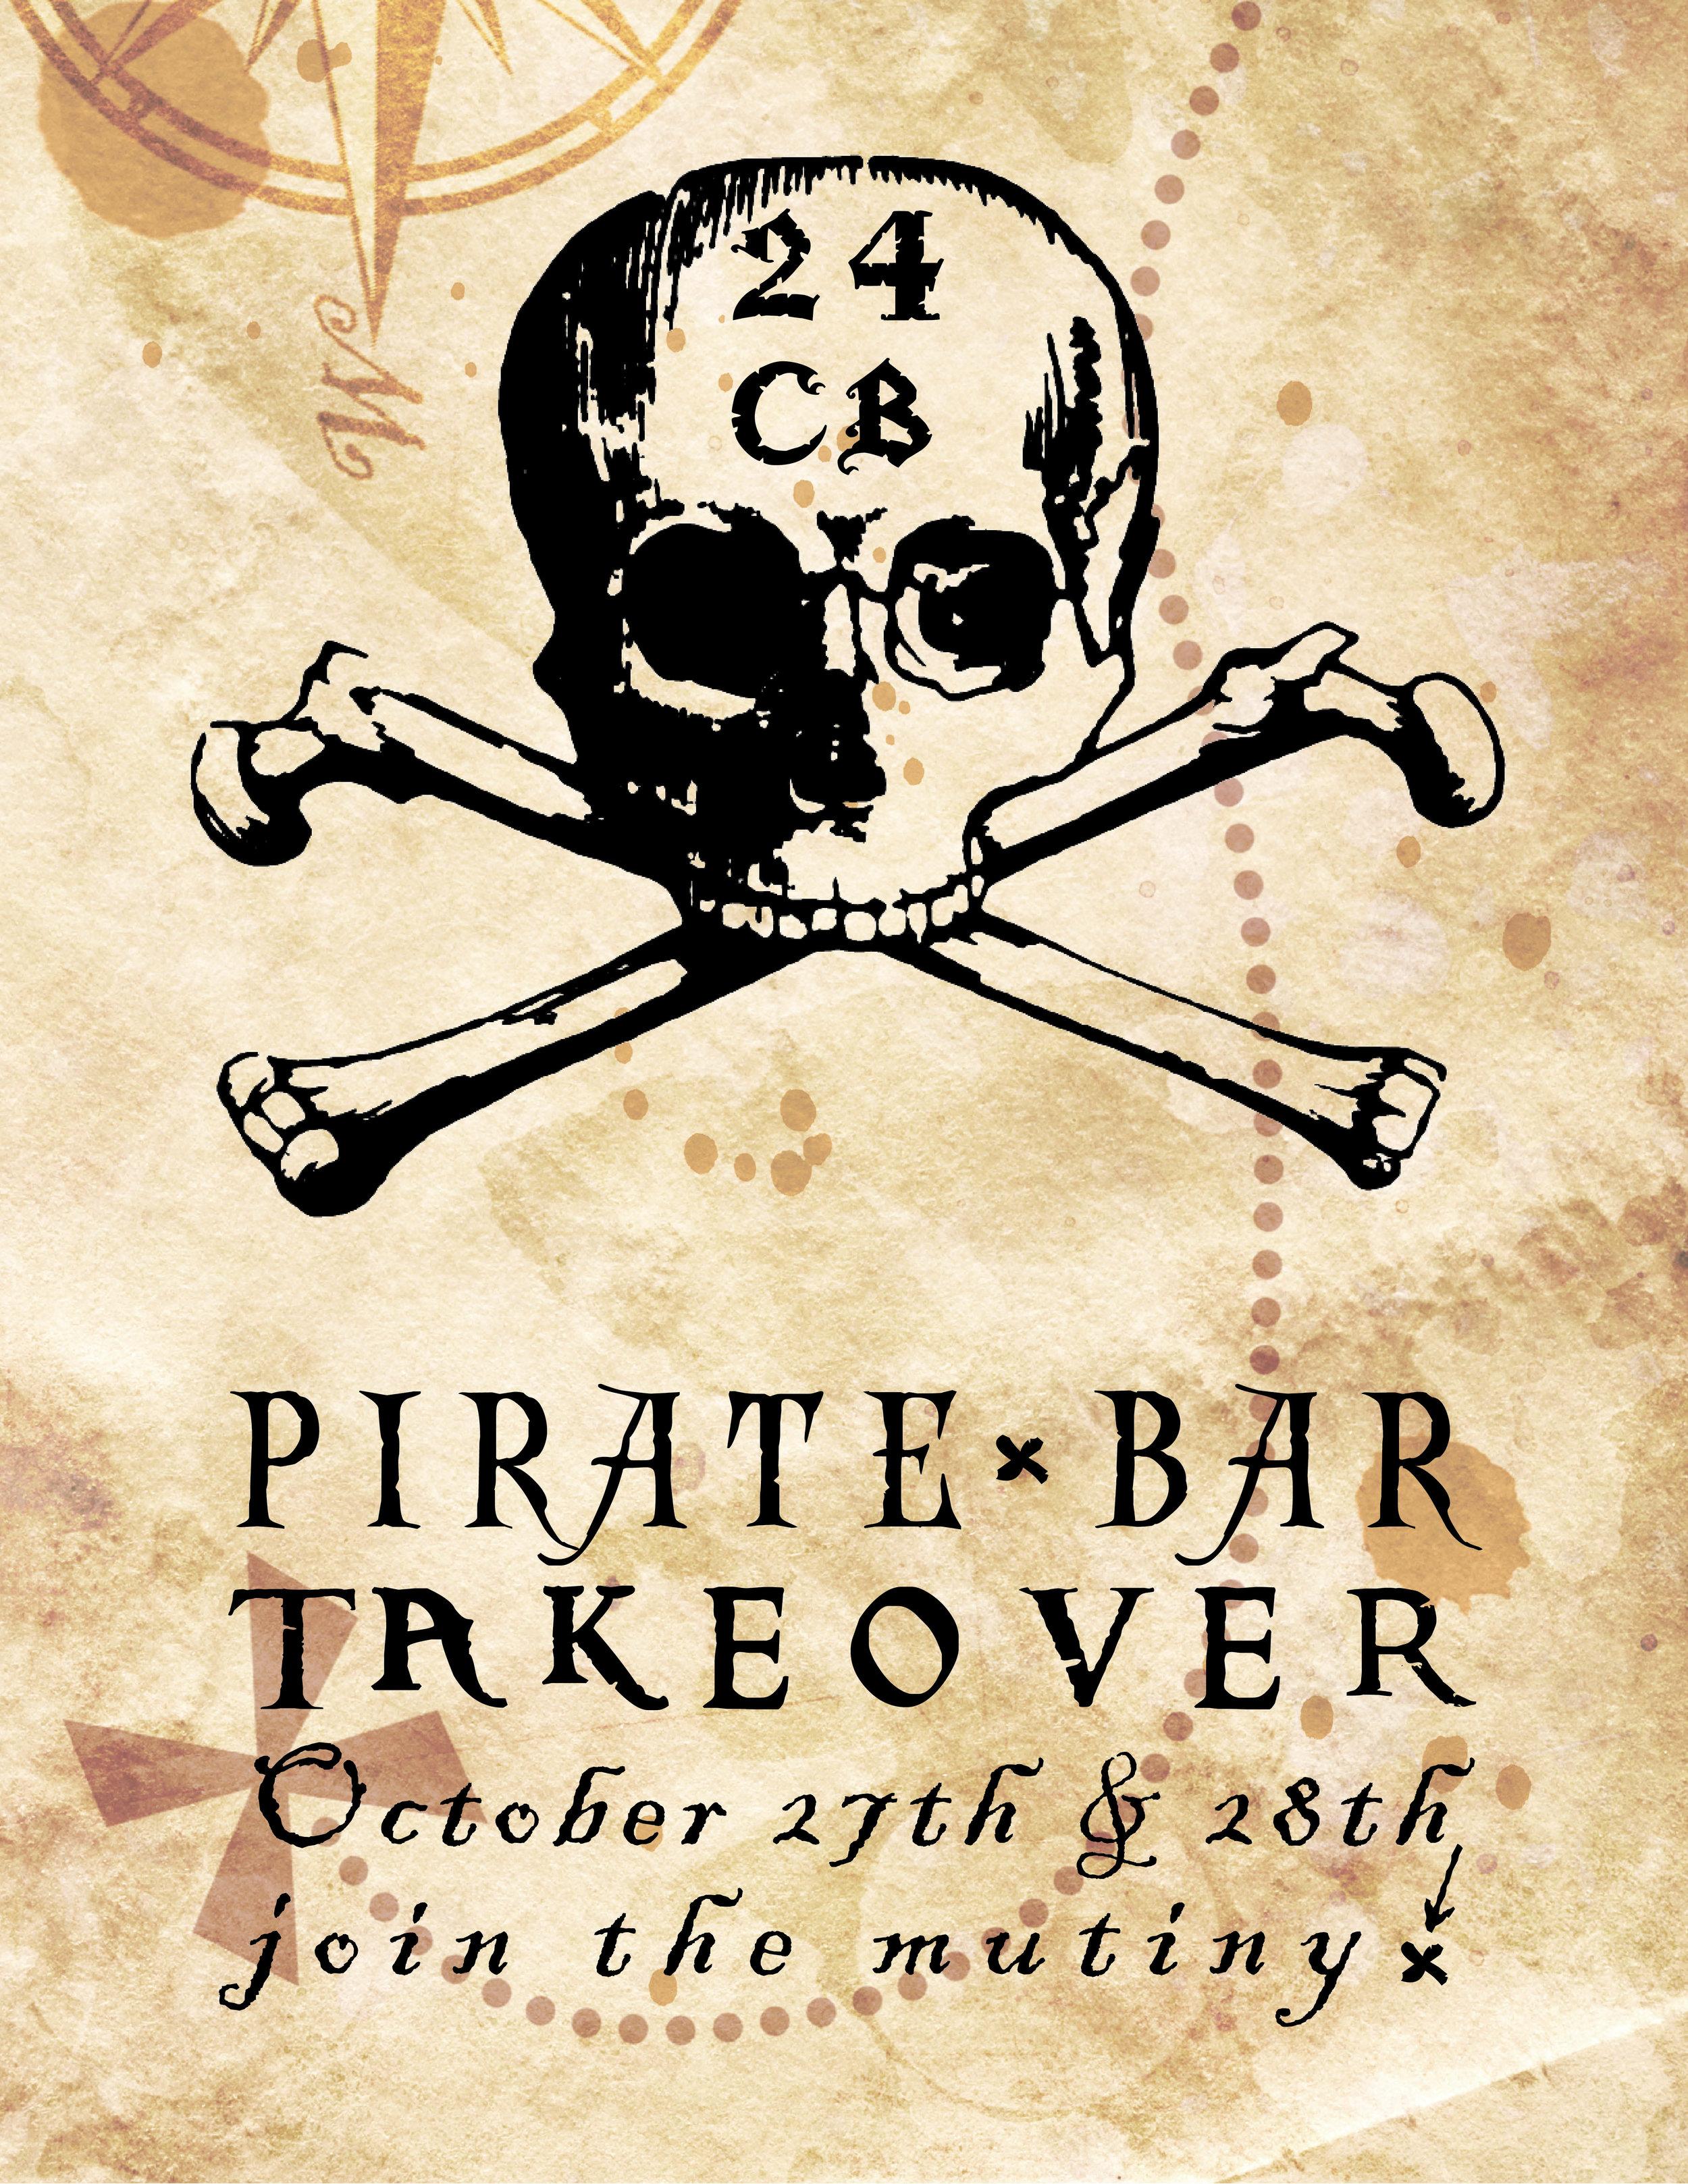 Pirate Party Web 8x10.jpg